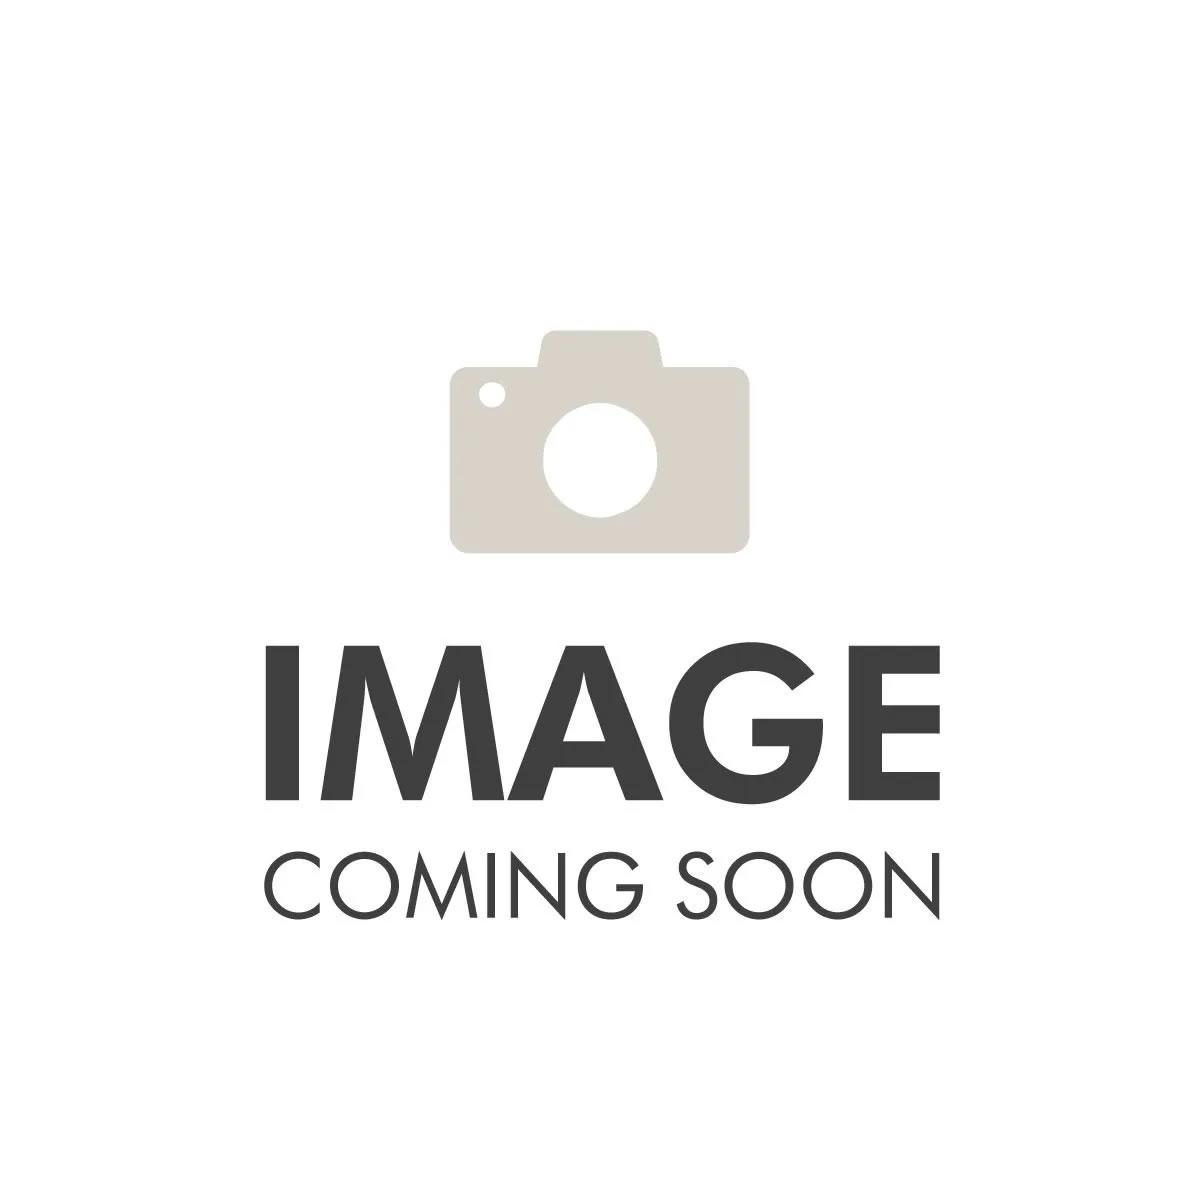 2003 Jeep Wrangler...Sorry, already sold